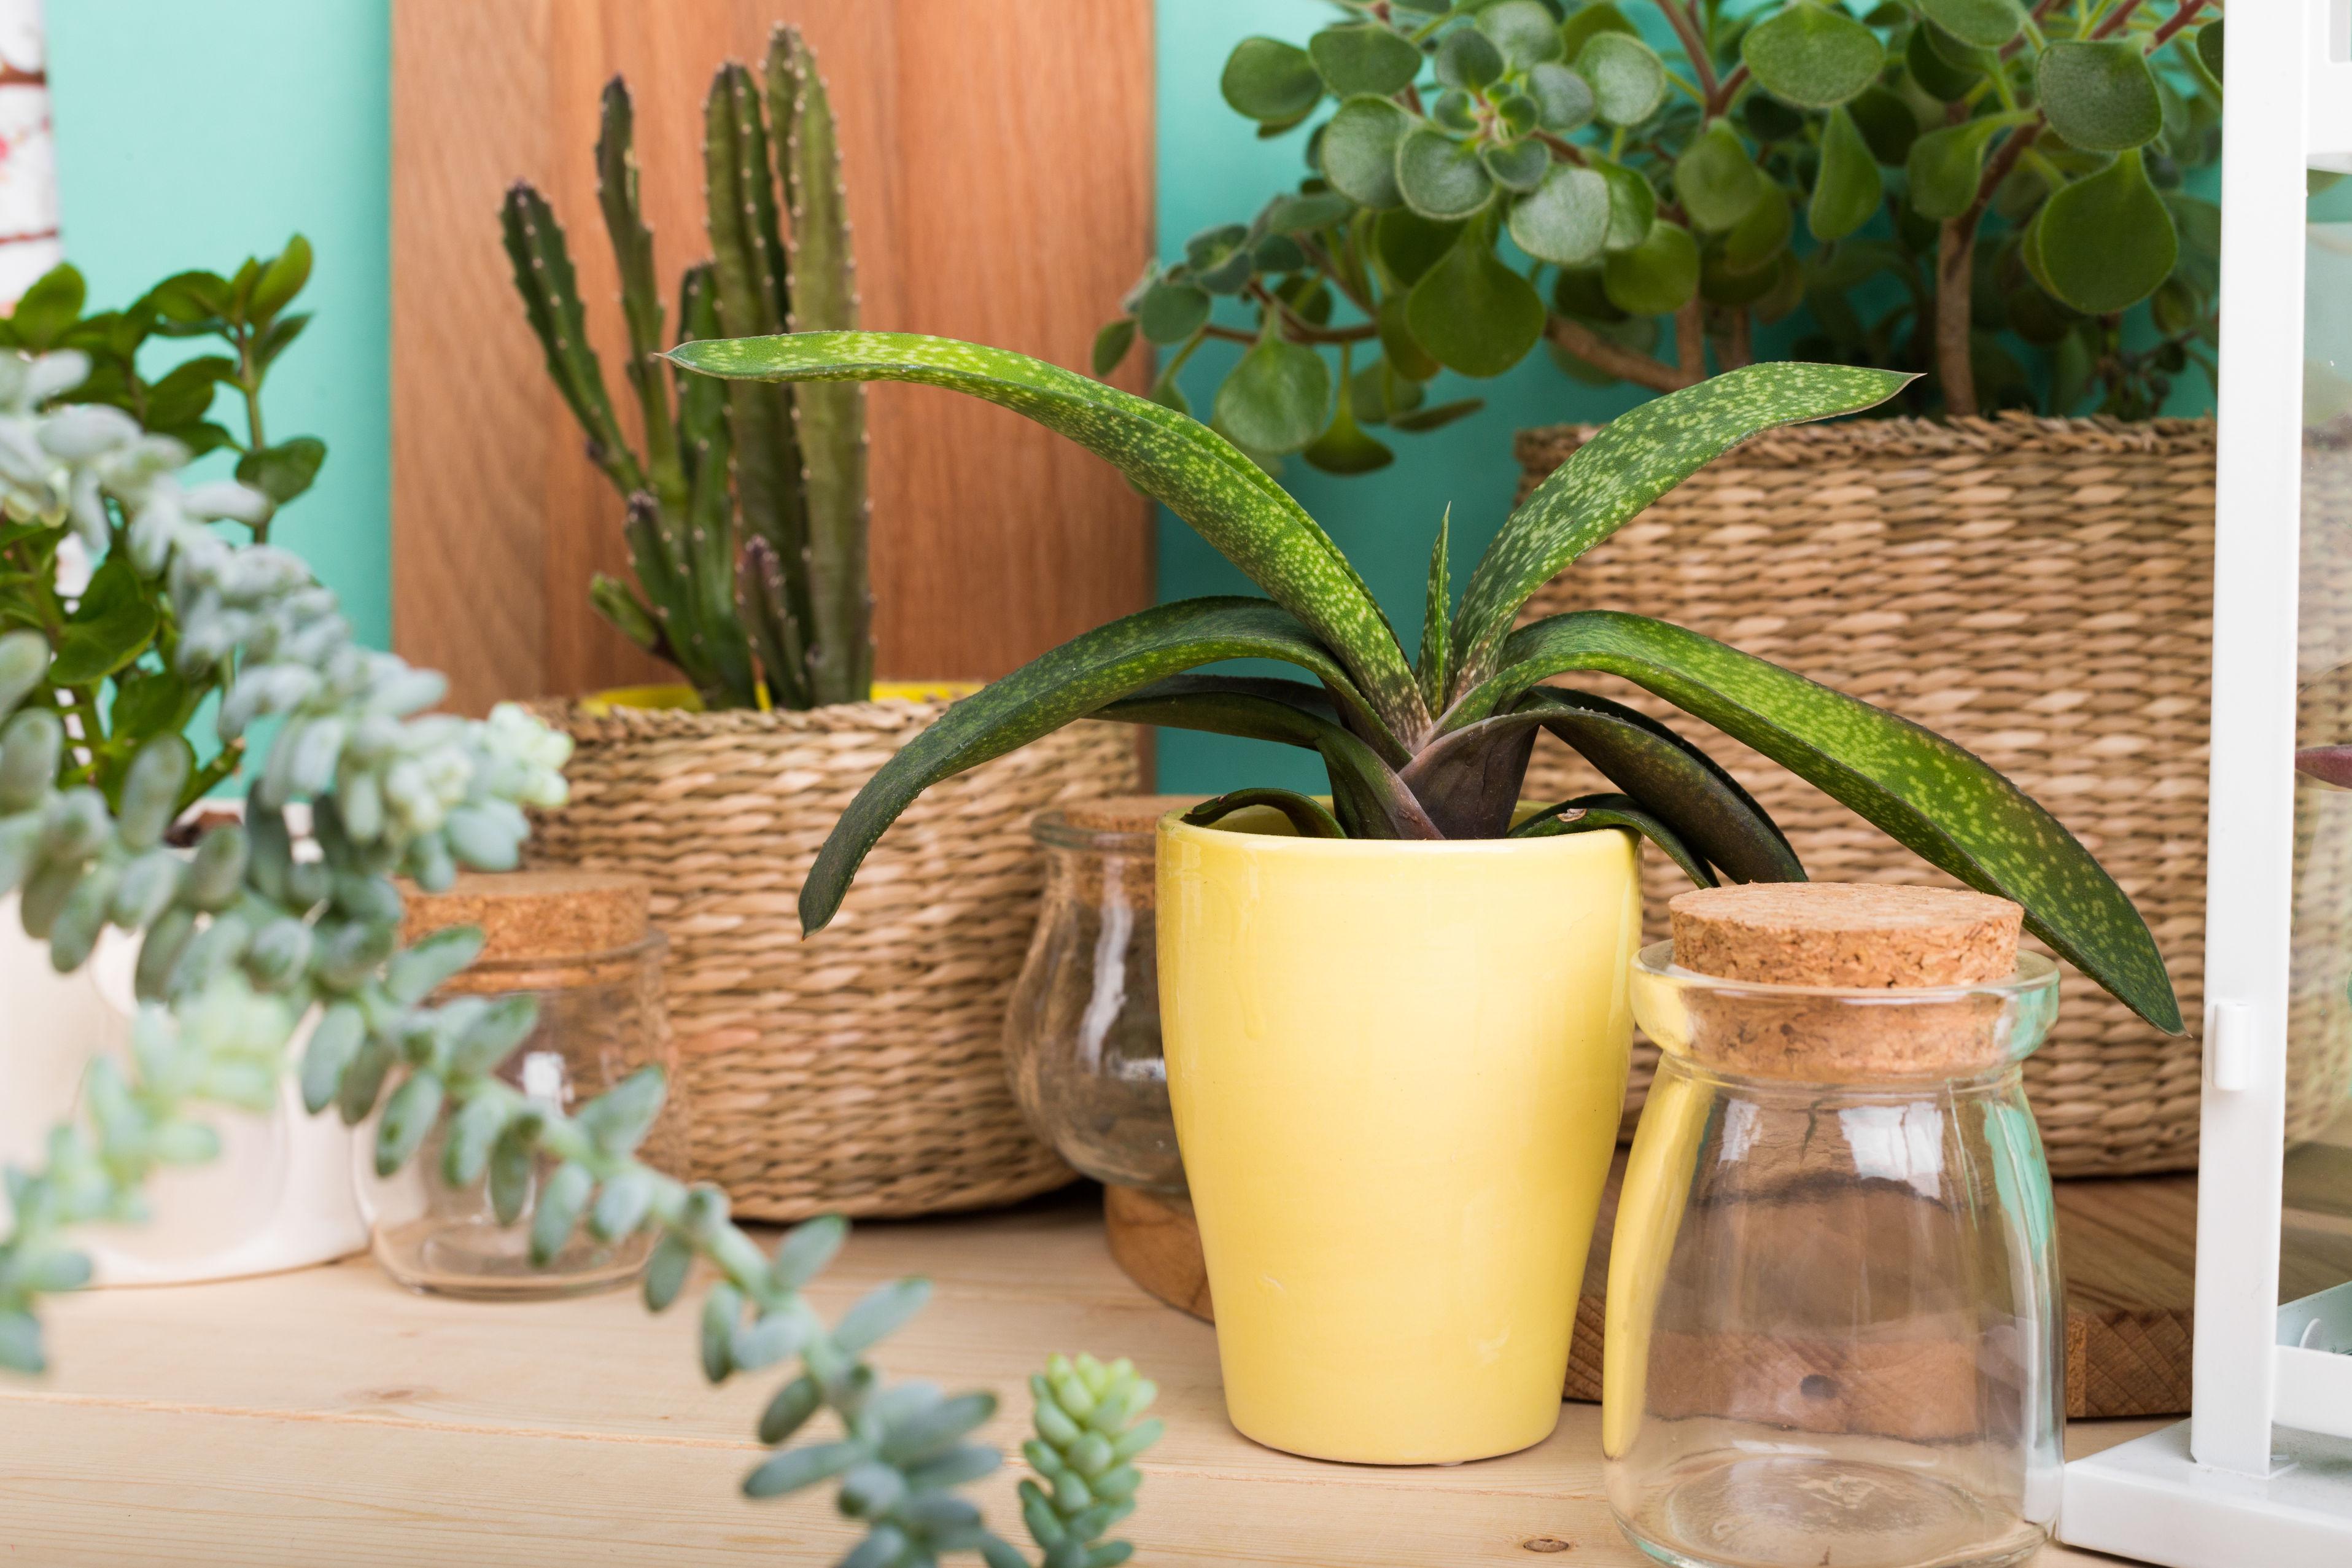 cactus dans paniers en osier